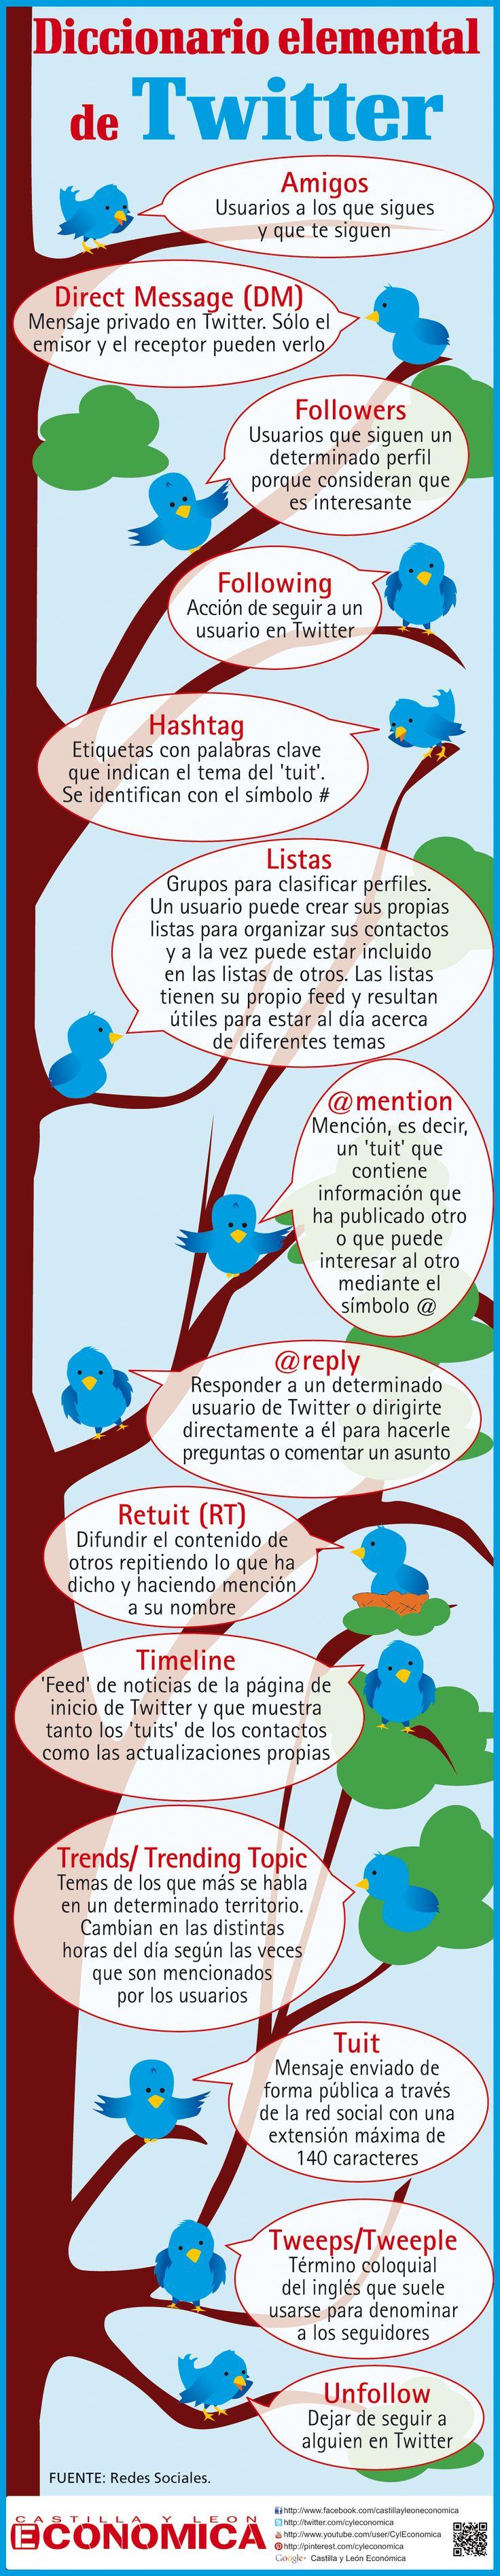 Diccionario elemental de Twitter #infografia #infographic #socialmedia